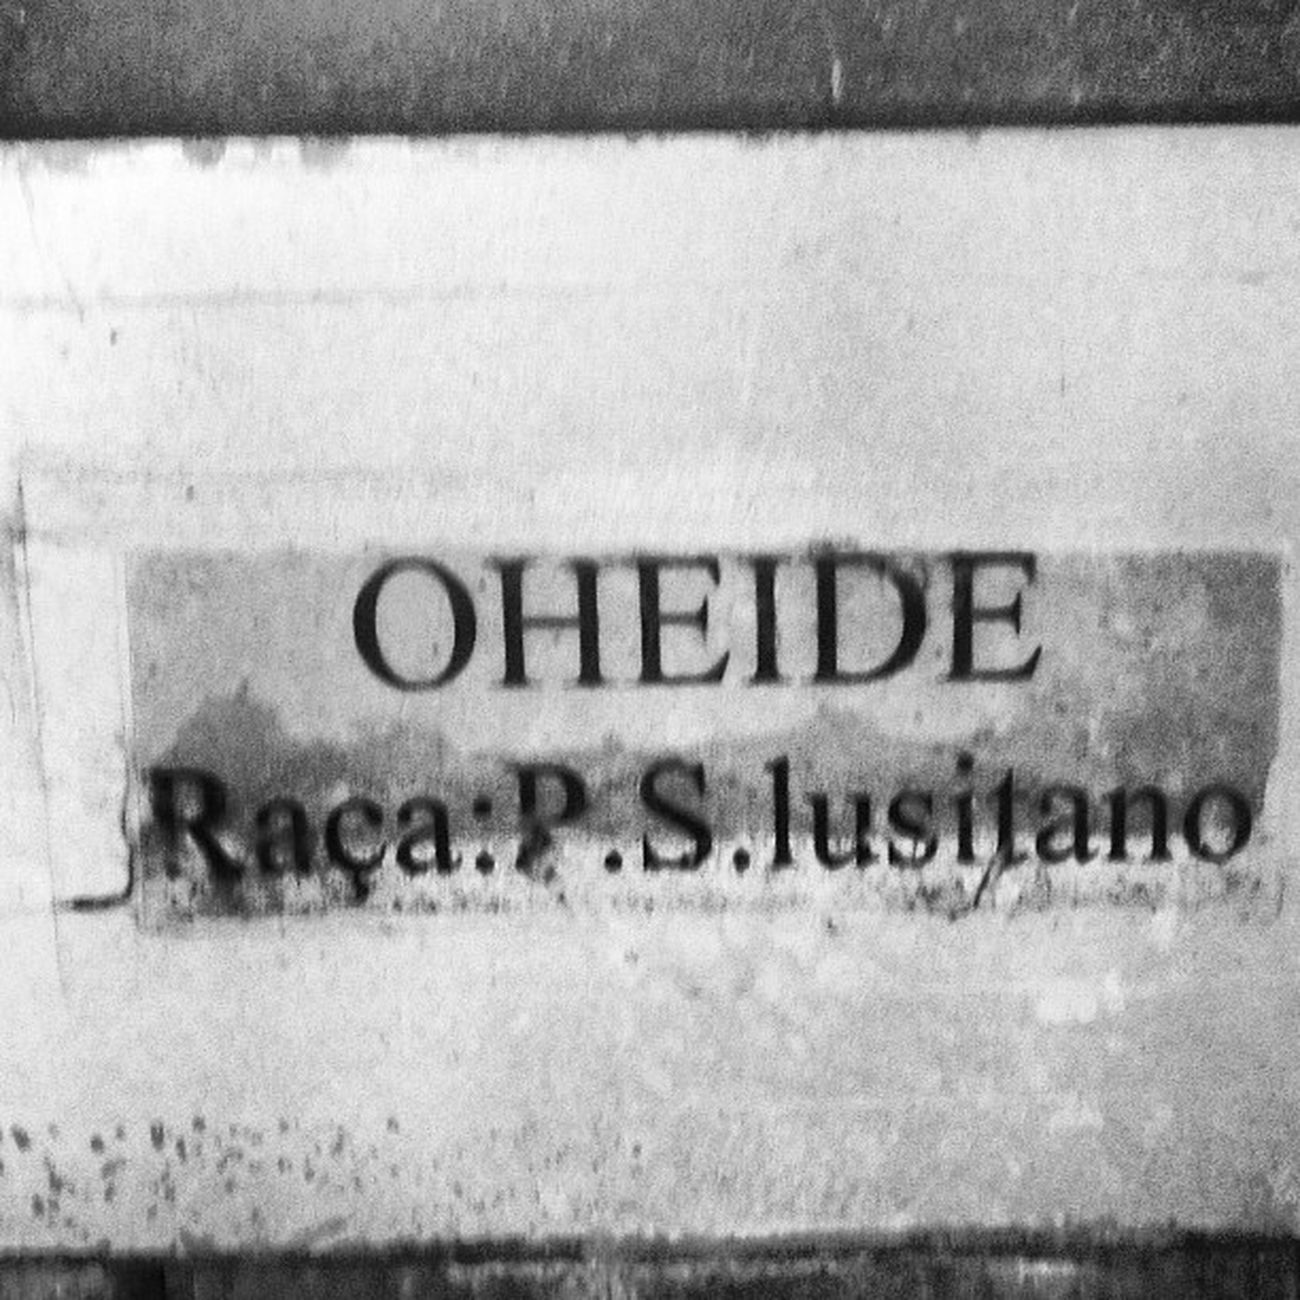 #alterdochao #portugaldenorteasul #portugaligers #igers #igersportugal #alentejo #iphone5 #iphonesia #iphonephotography #iphoneonly #portugaldenorteasul #instagood #instagram #instalove #instamood #instagramers #instagramhub #pictureoftheday #photooftheda Instagood Instagramhub Pictureoftheday Photography Instalove Horses Portugaligers Iphoneonly Igersportugal Photooftheday Portugaldenorteasul Iphonesia Alterreal Instagram Alterdochao IPhone5 Coudelariadealter Instamood Iphonephotography Cavalos Igers Cavalolusitano Alentejo Instagramers